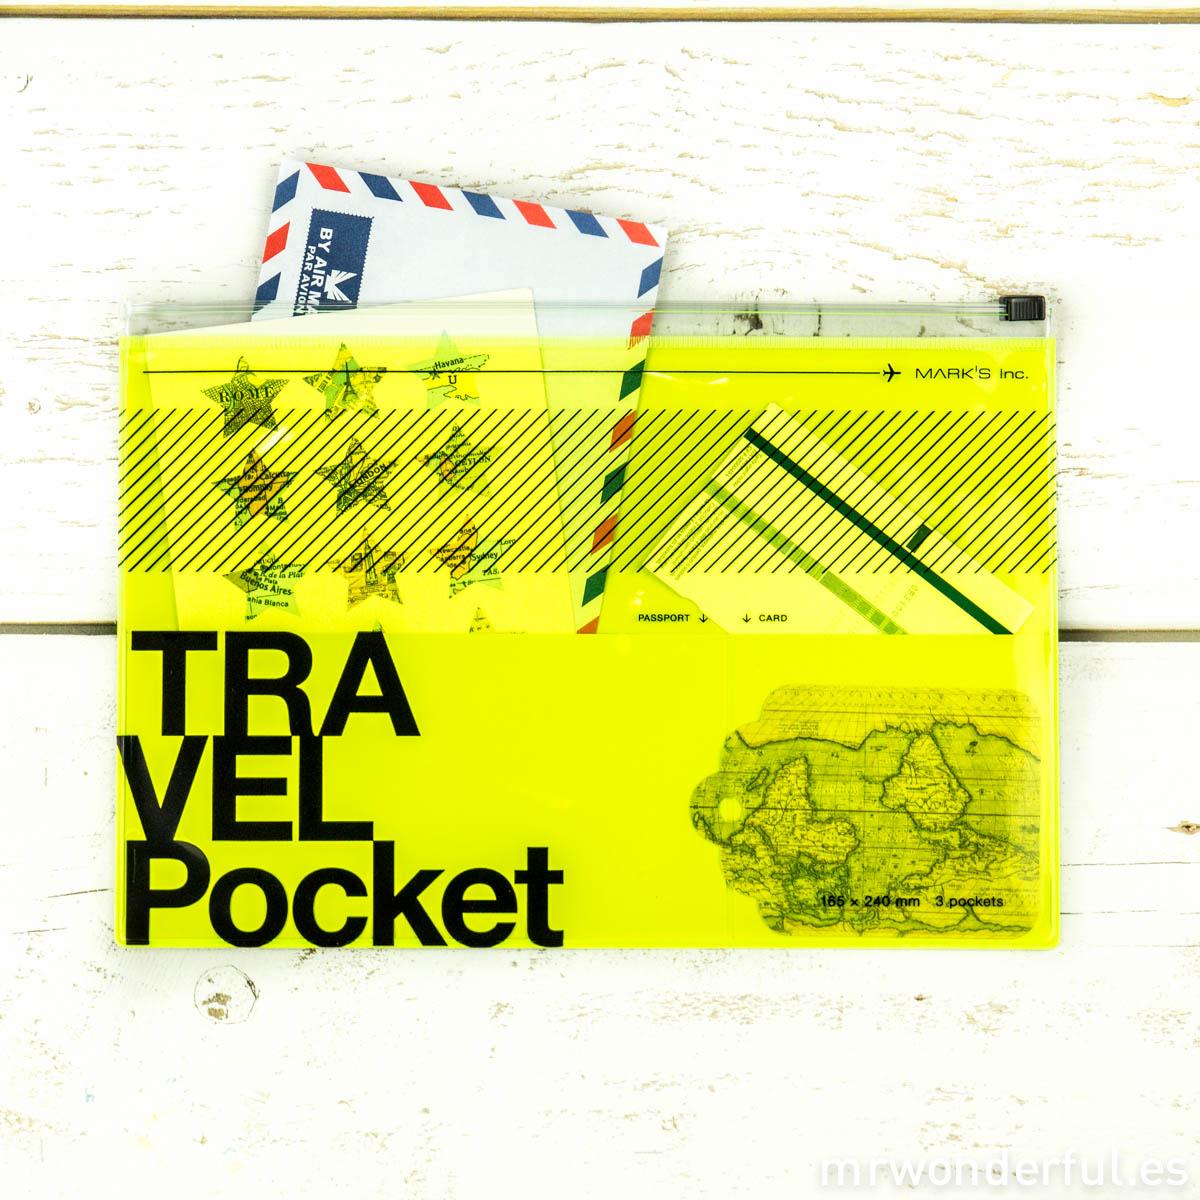 mrwonderful_TVK-VC1-NYE_portadocumentos-viaje-amarillo-8